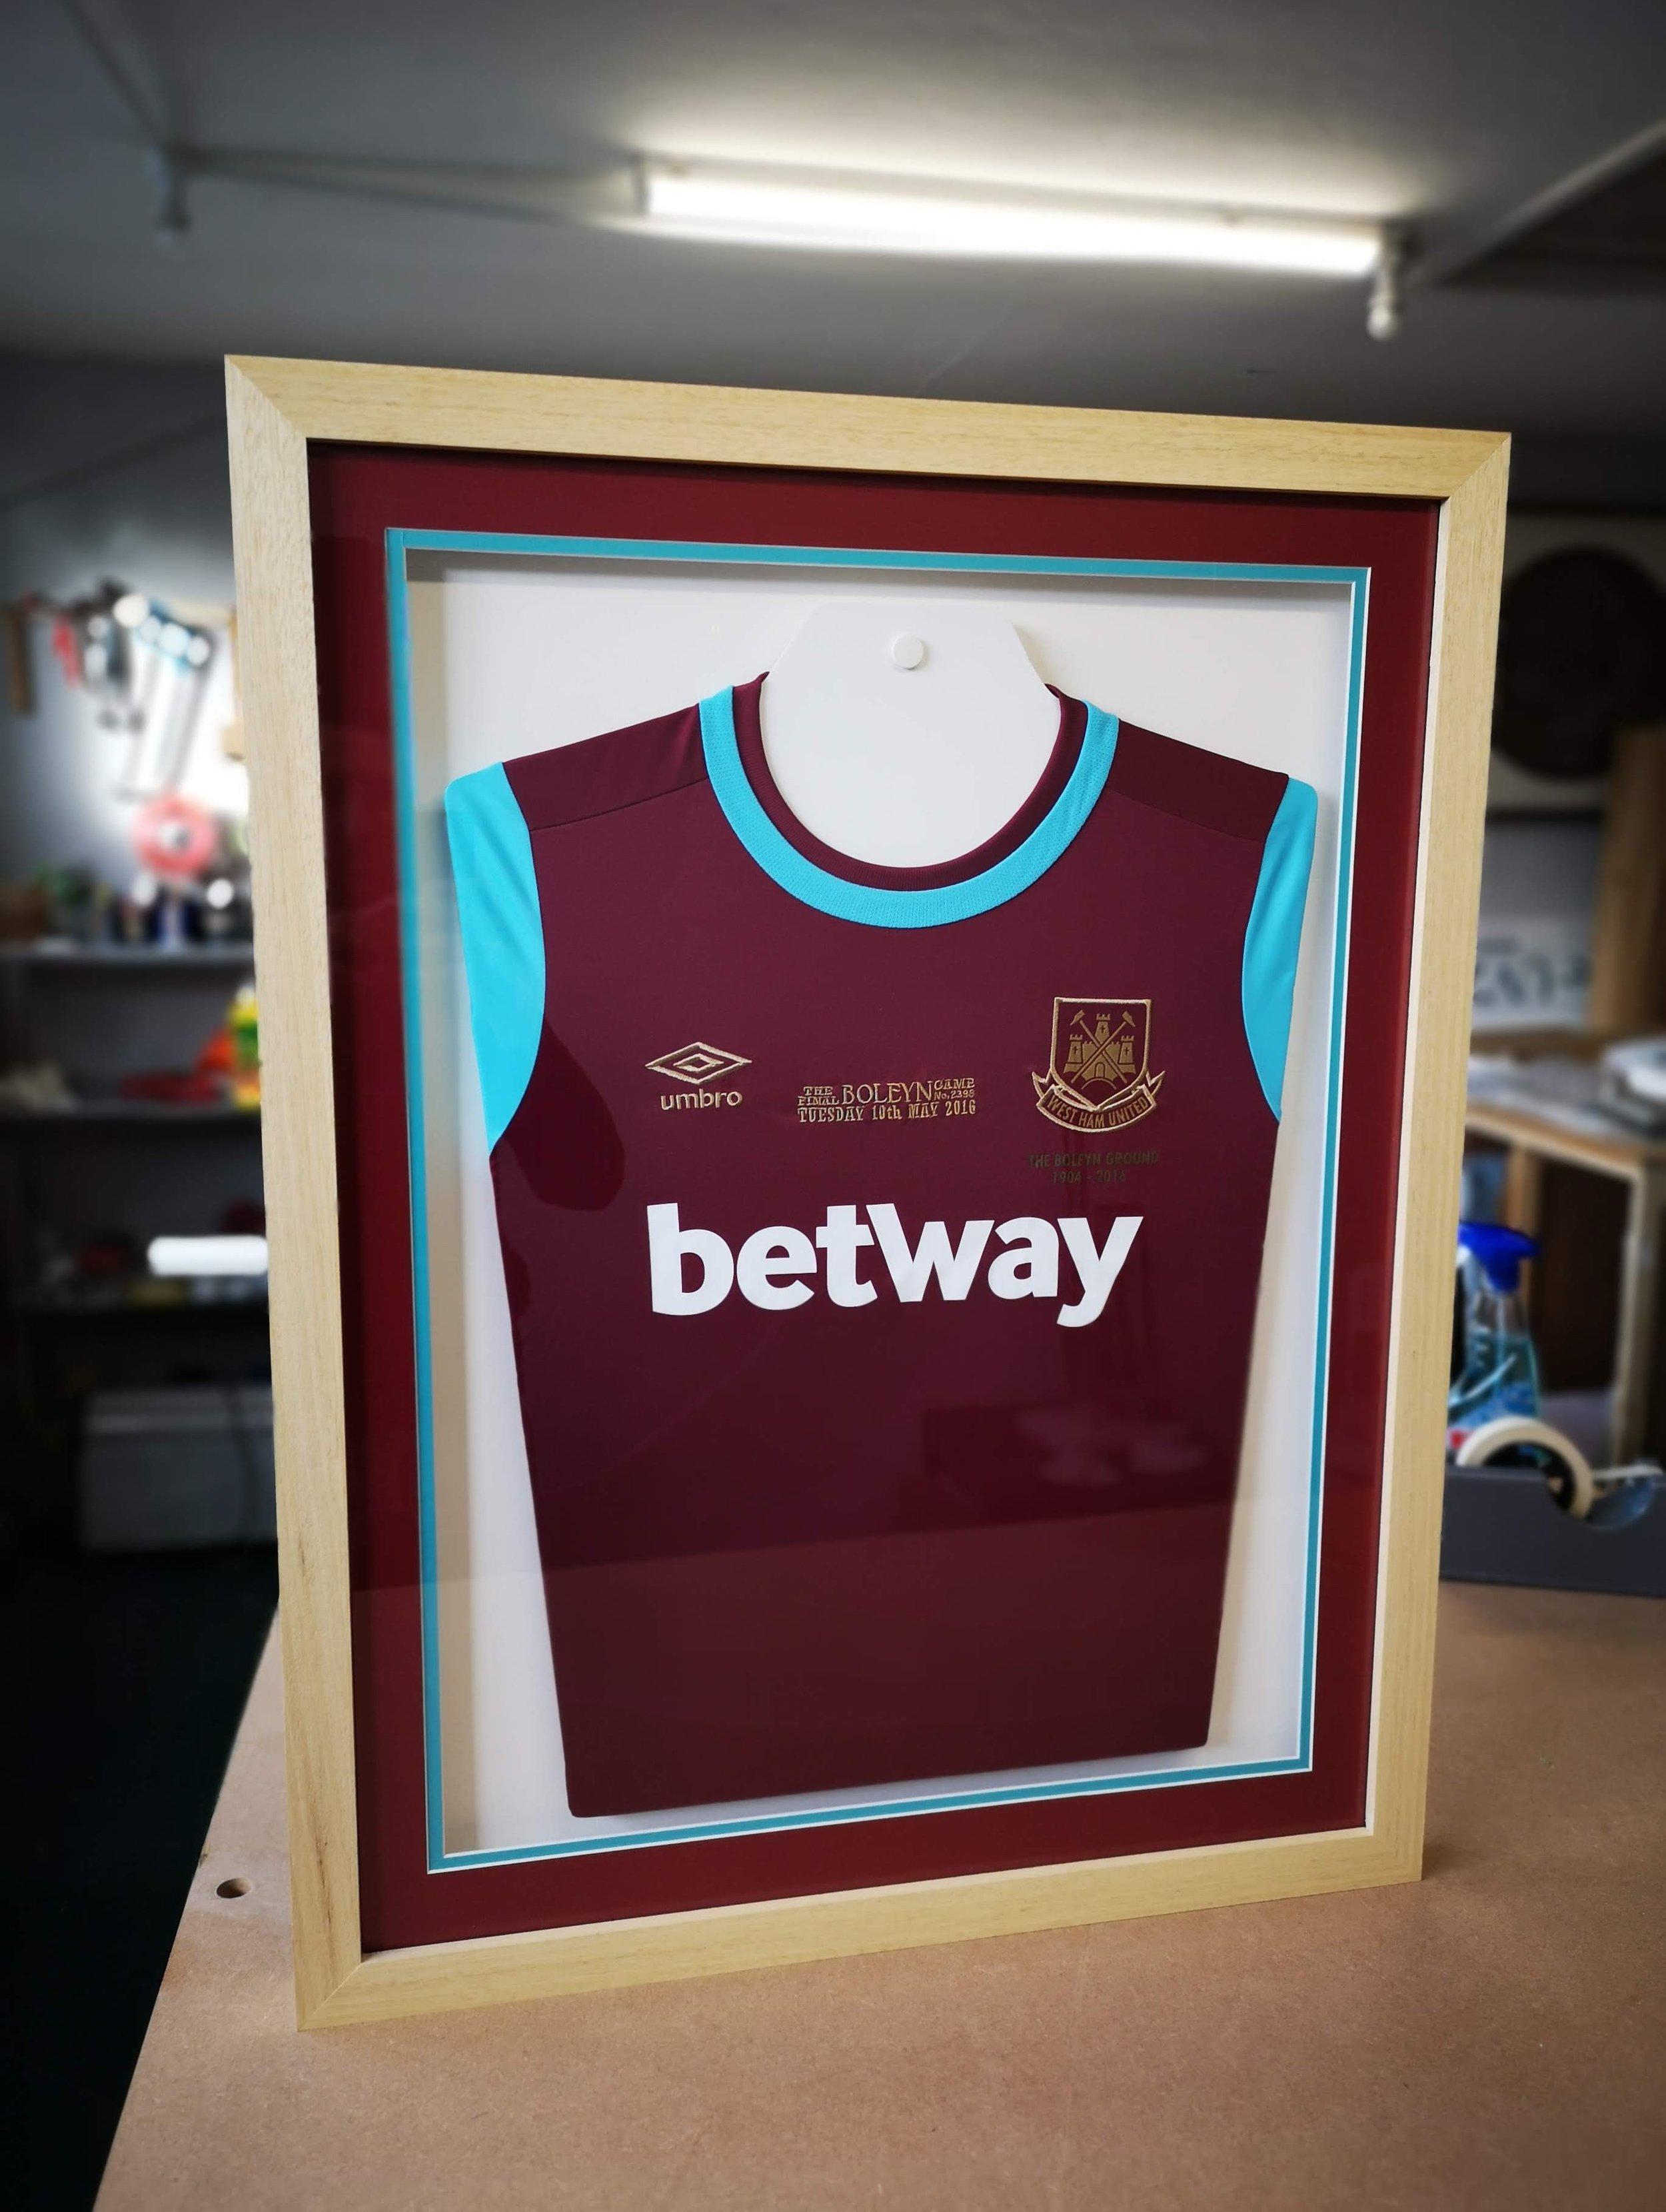 west ham football club betway shirt